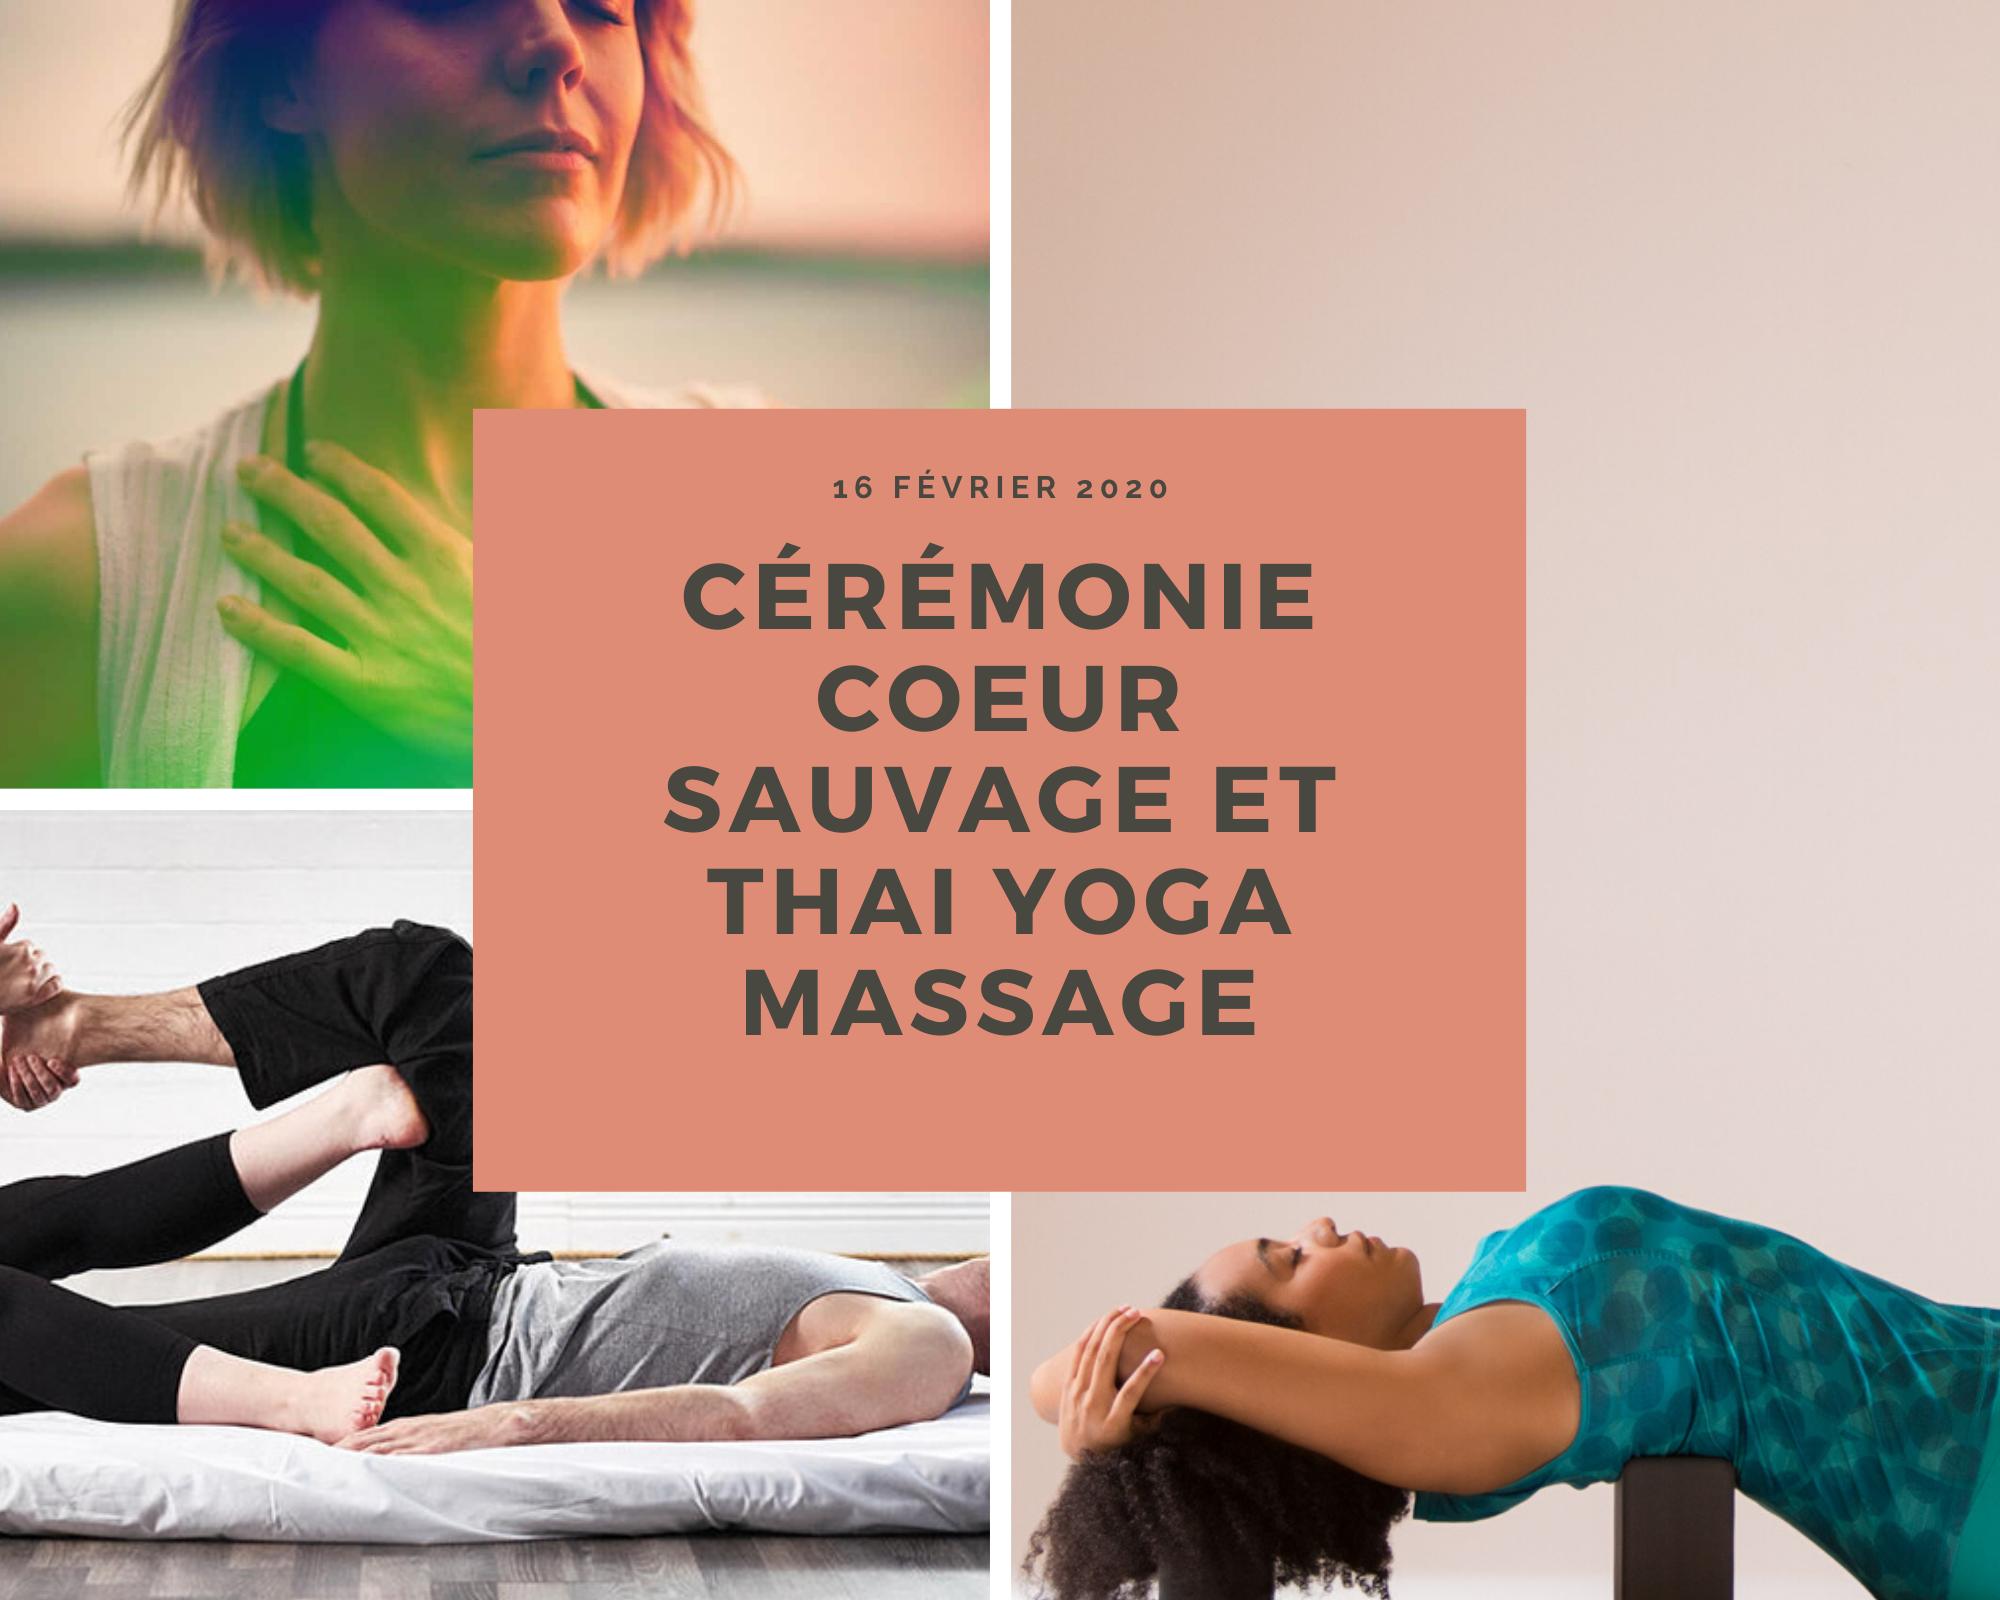 Cérémonie coeur sauvage et thai massage